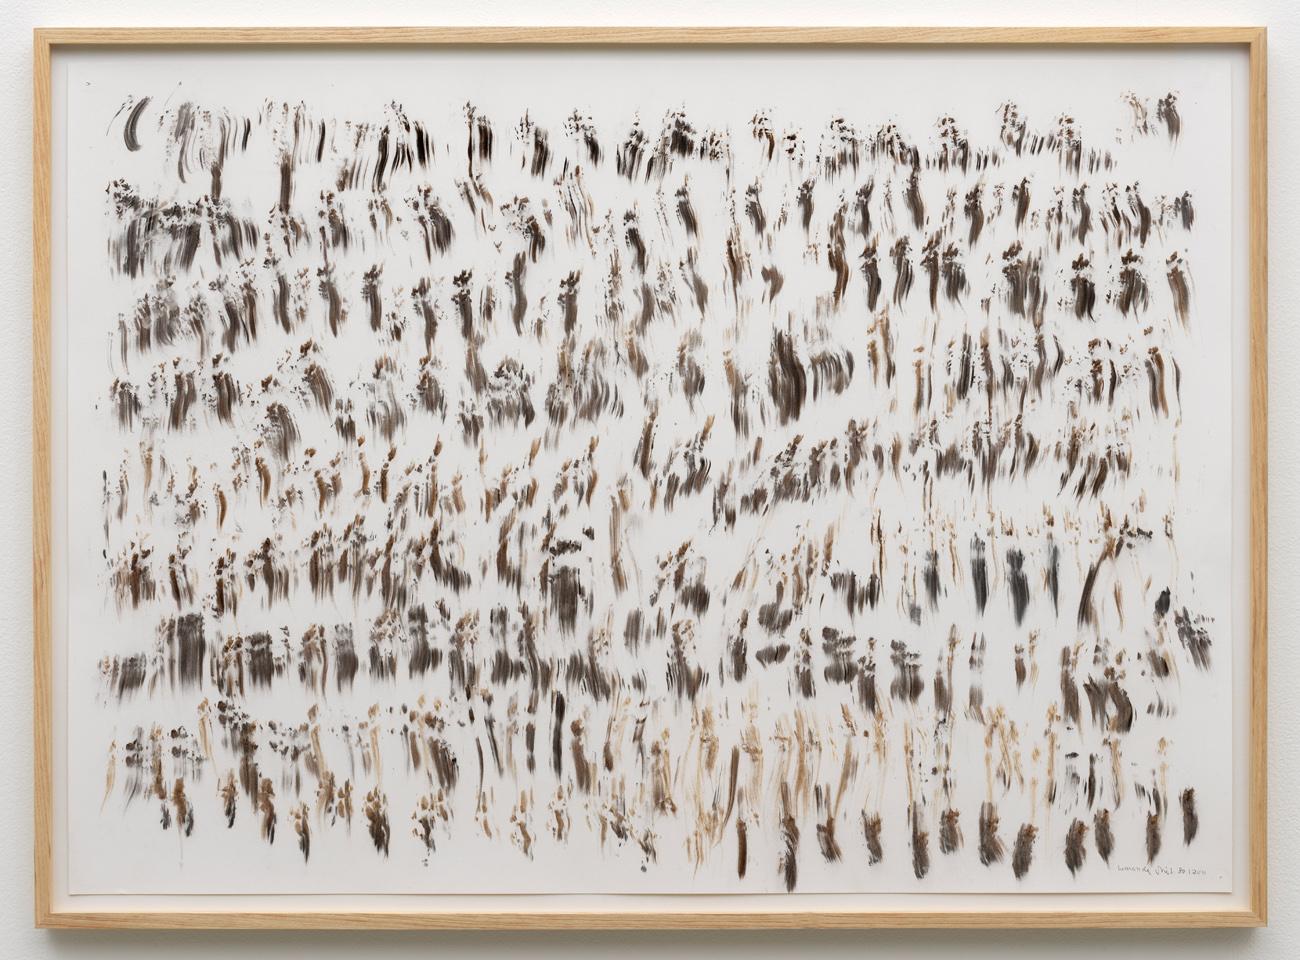 herman de vries, untitled, 2011